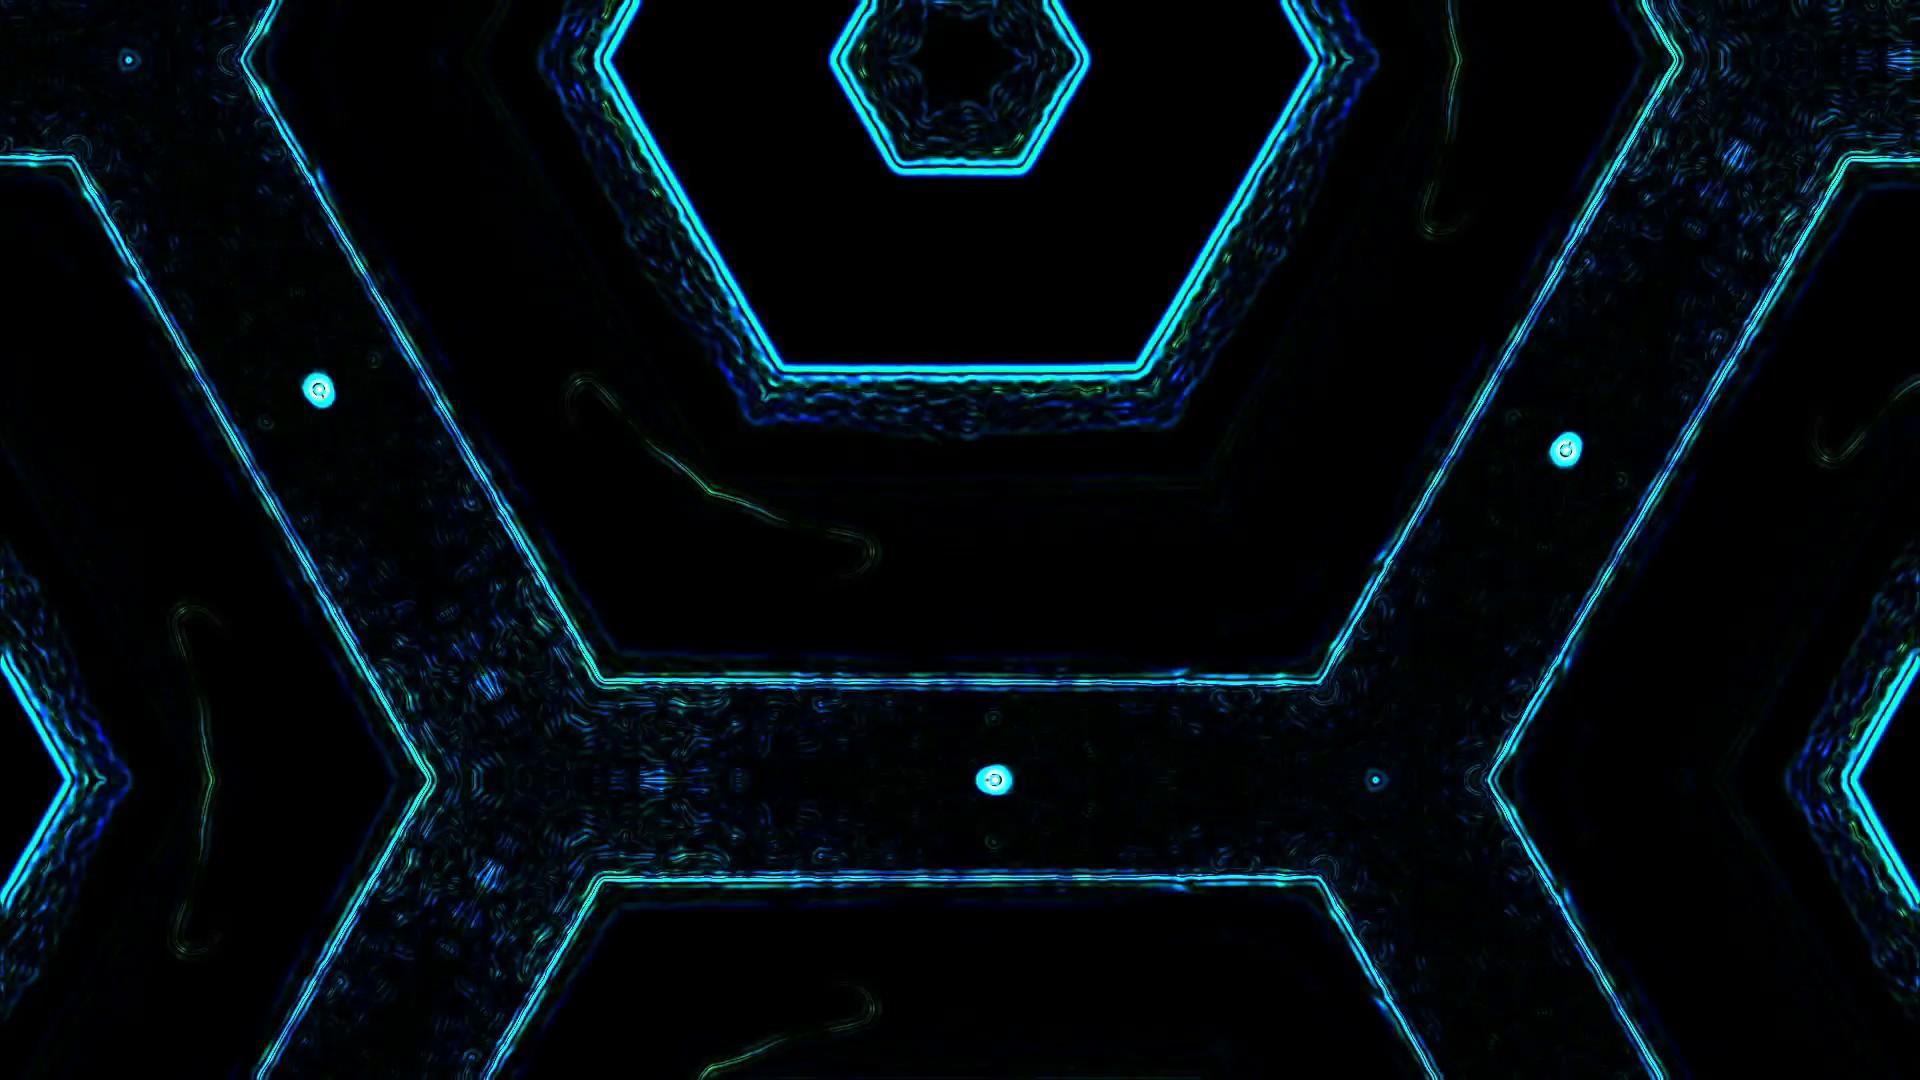 I Love Techno Wallpaper Iphone : Techno background ?? Download free beautiful HD ...